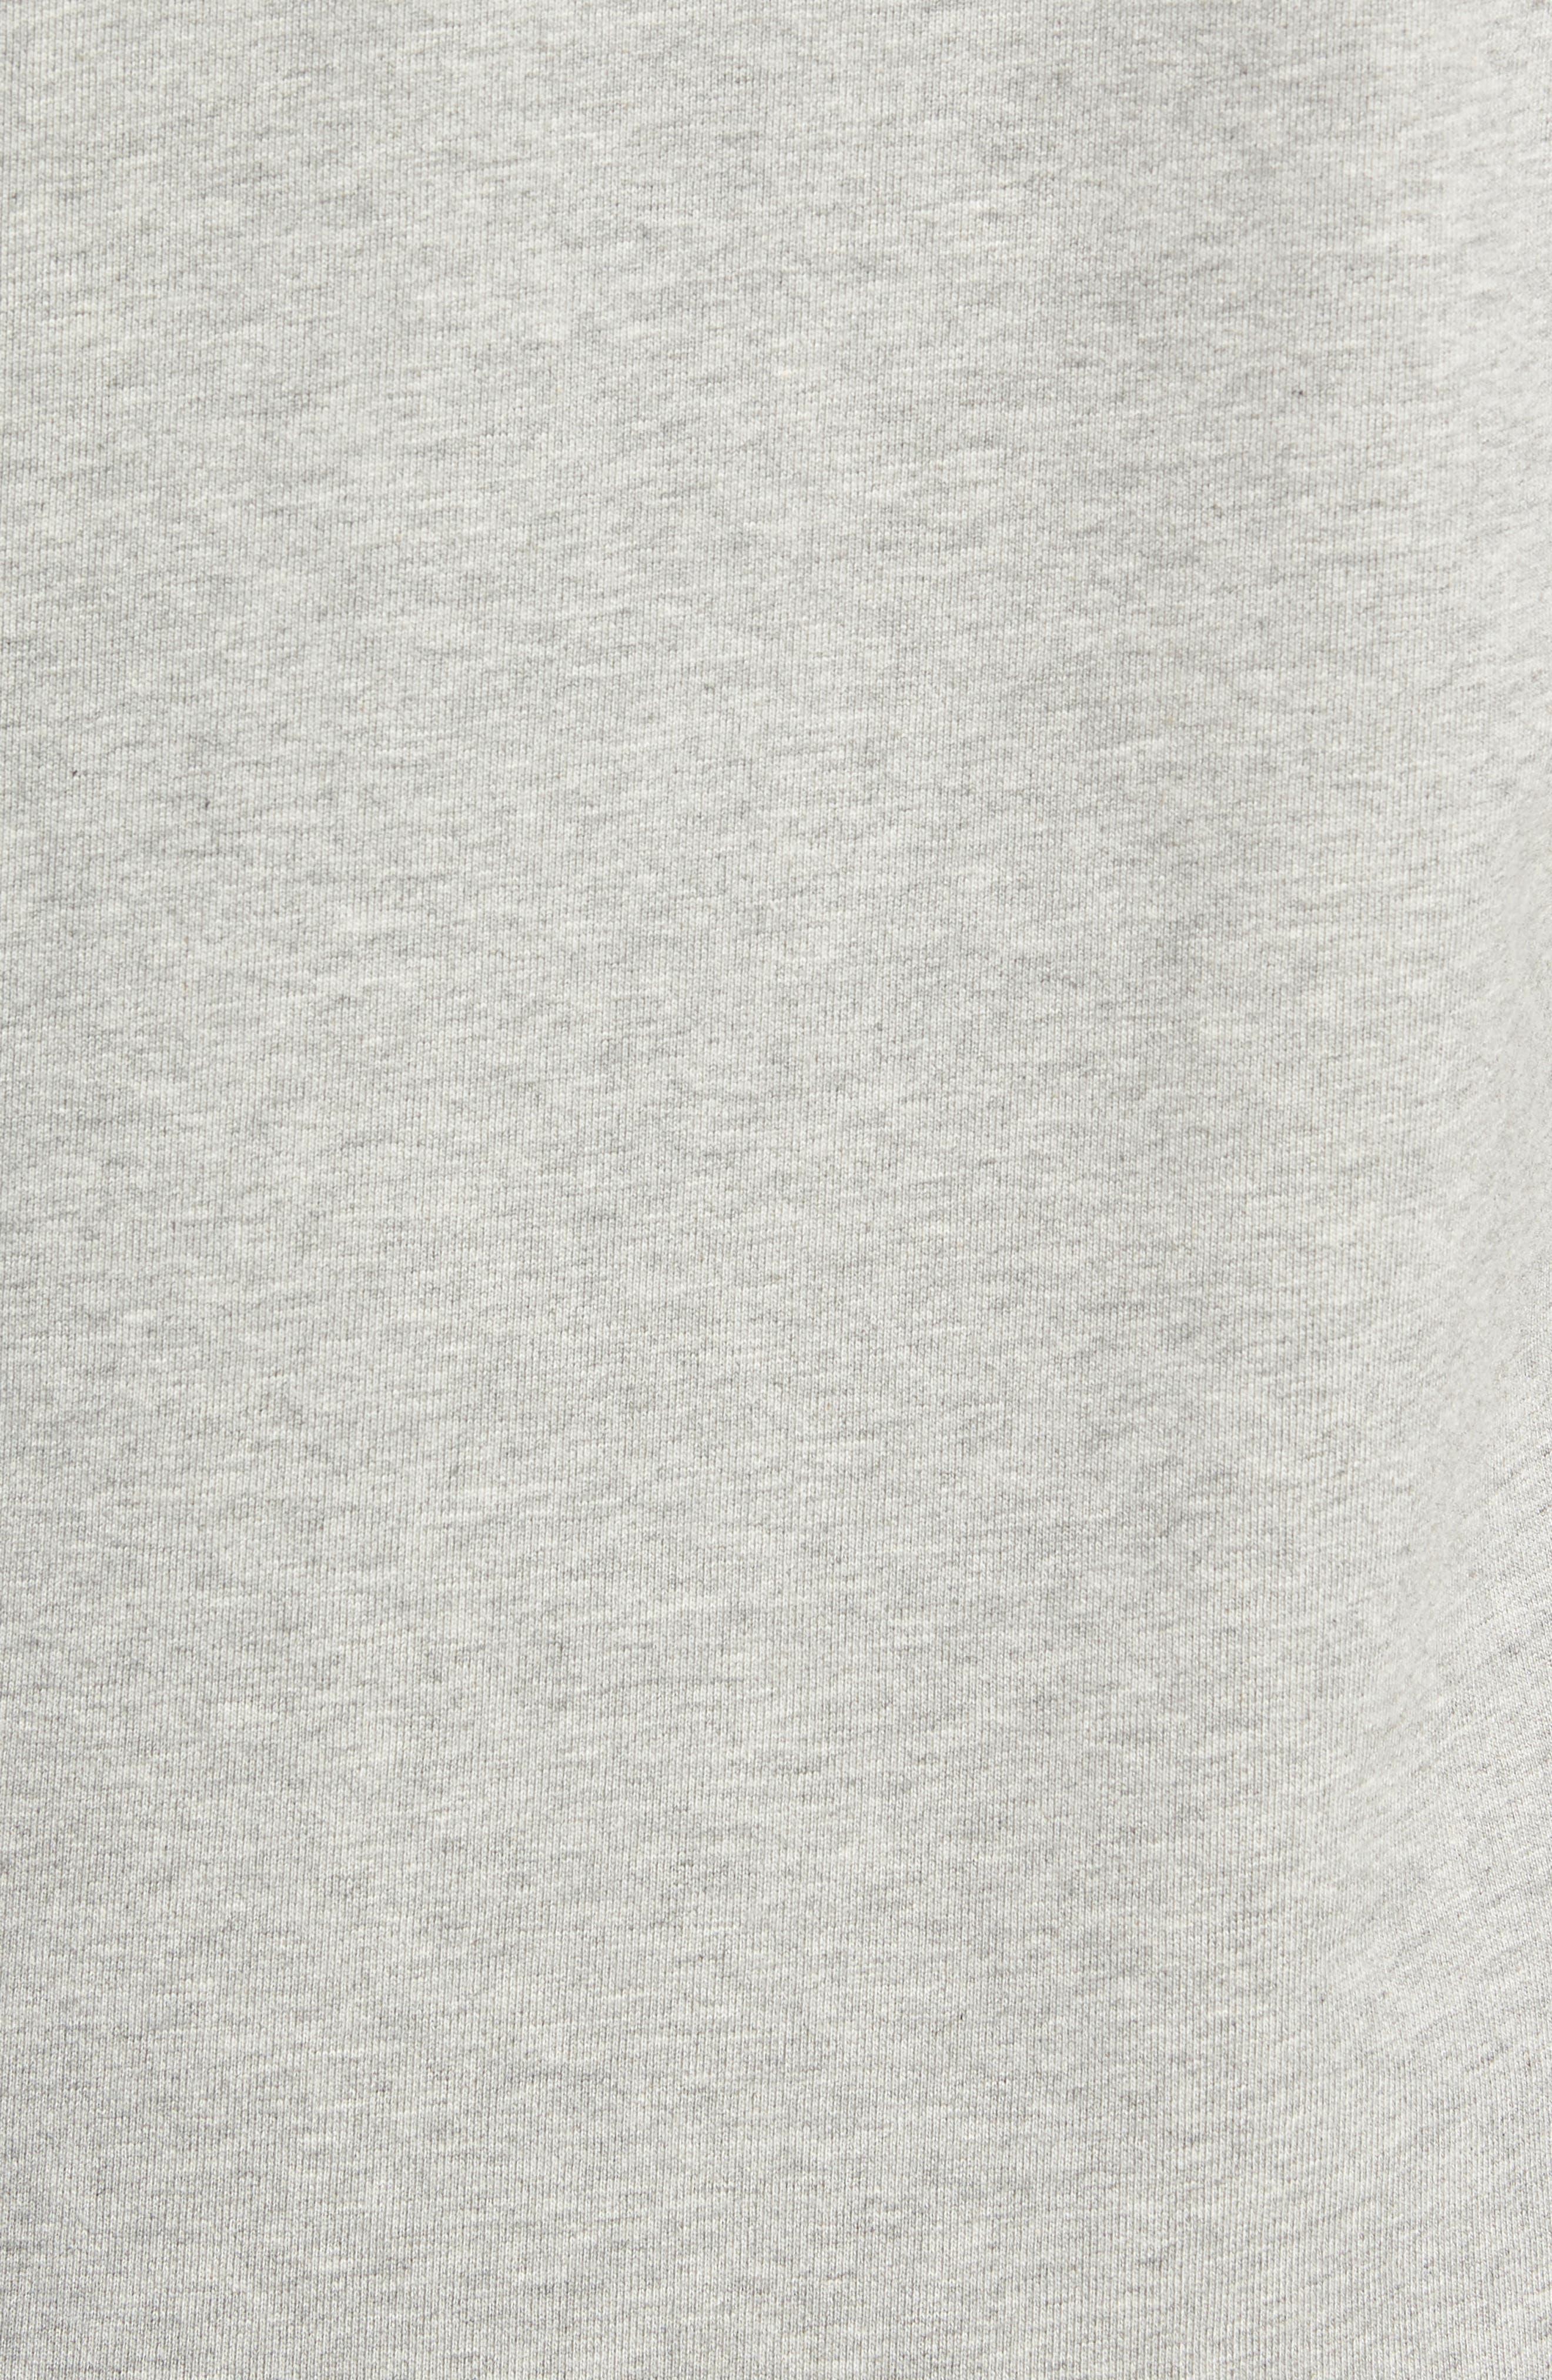 REIGNING CHAMP, Gym Logo Sweatshirt, Alternate thumbnail 5, color, HEATHER GREY/ BLACK